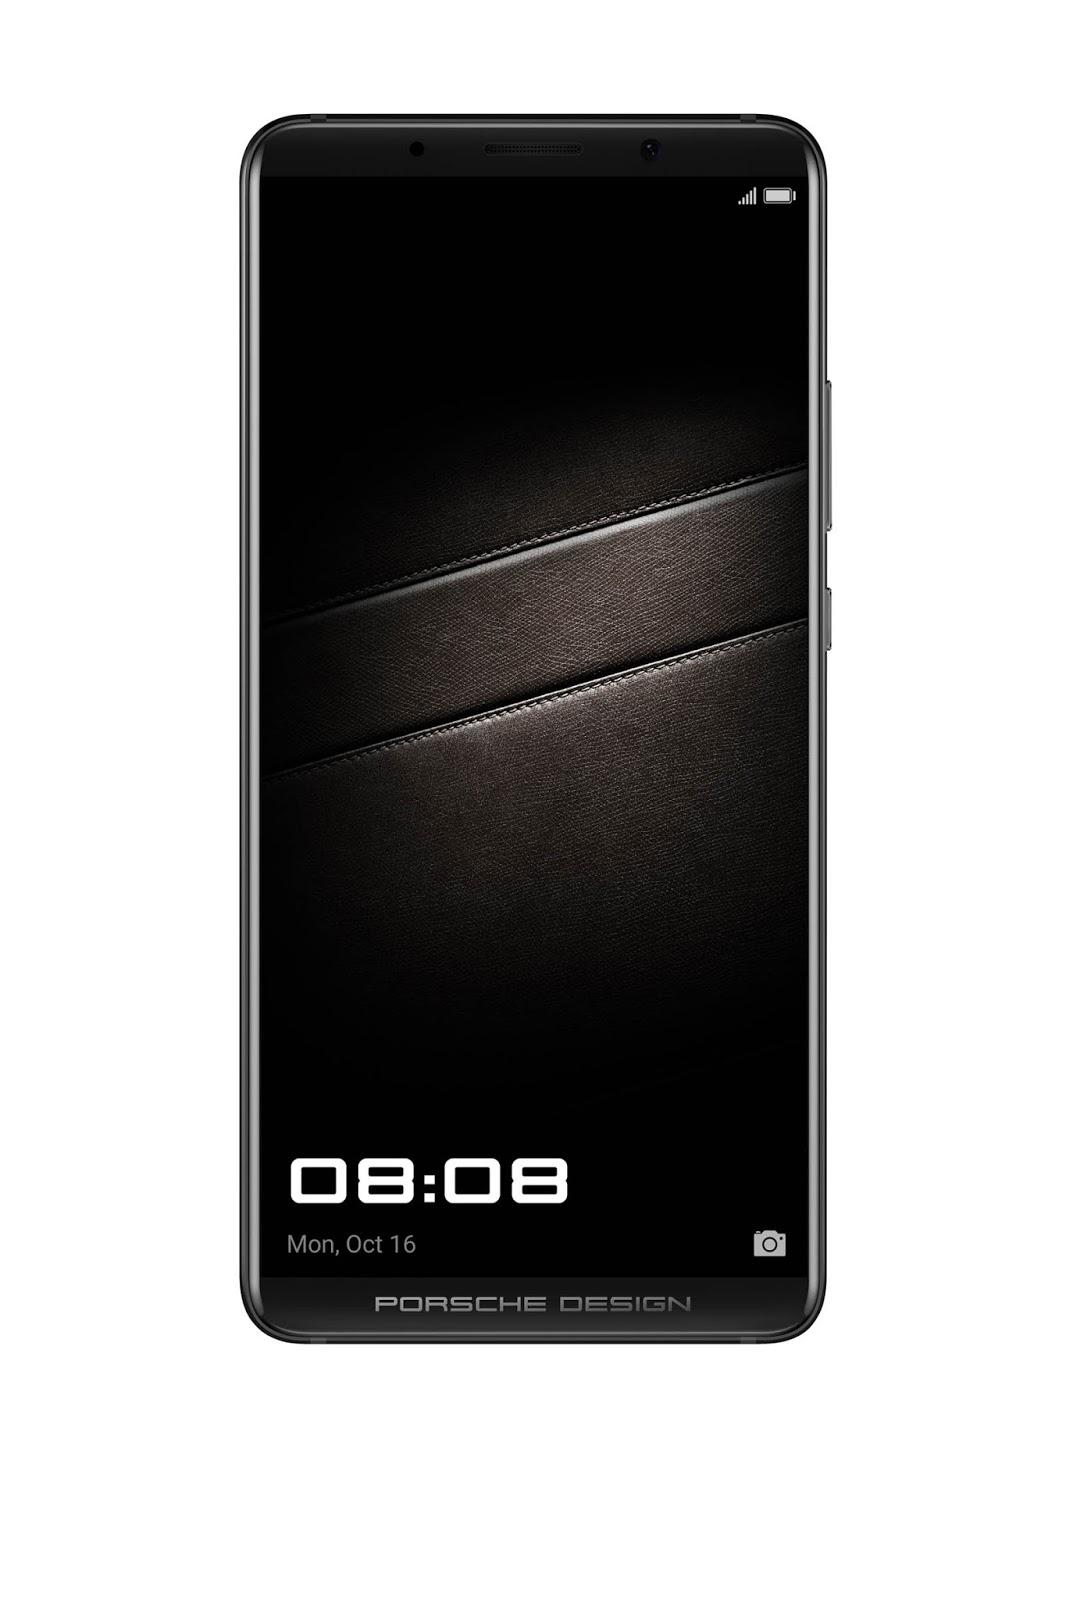 Huawei_Mate_10_Porsche_Design_04